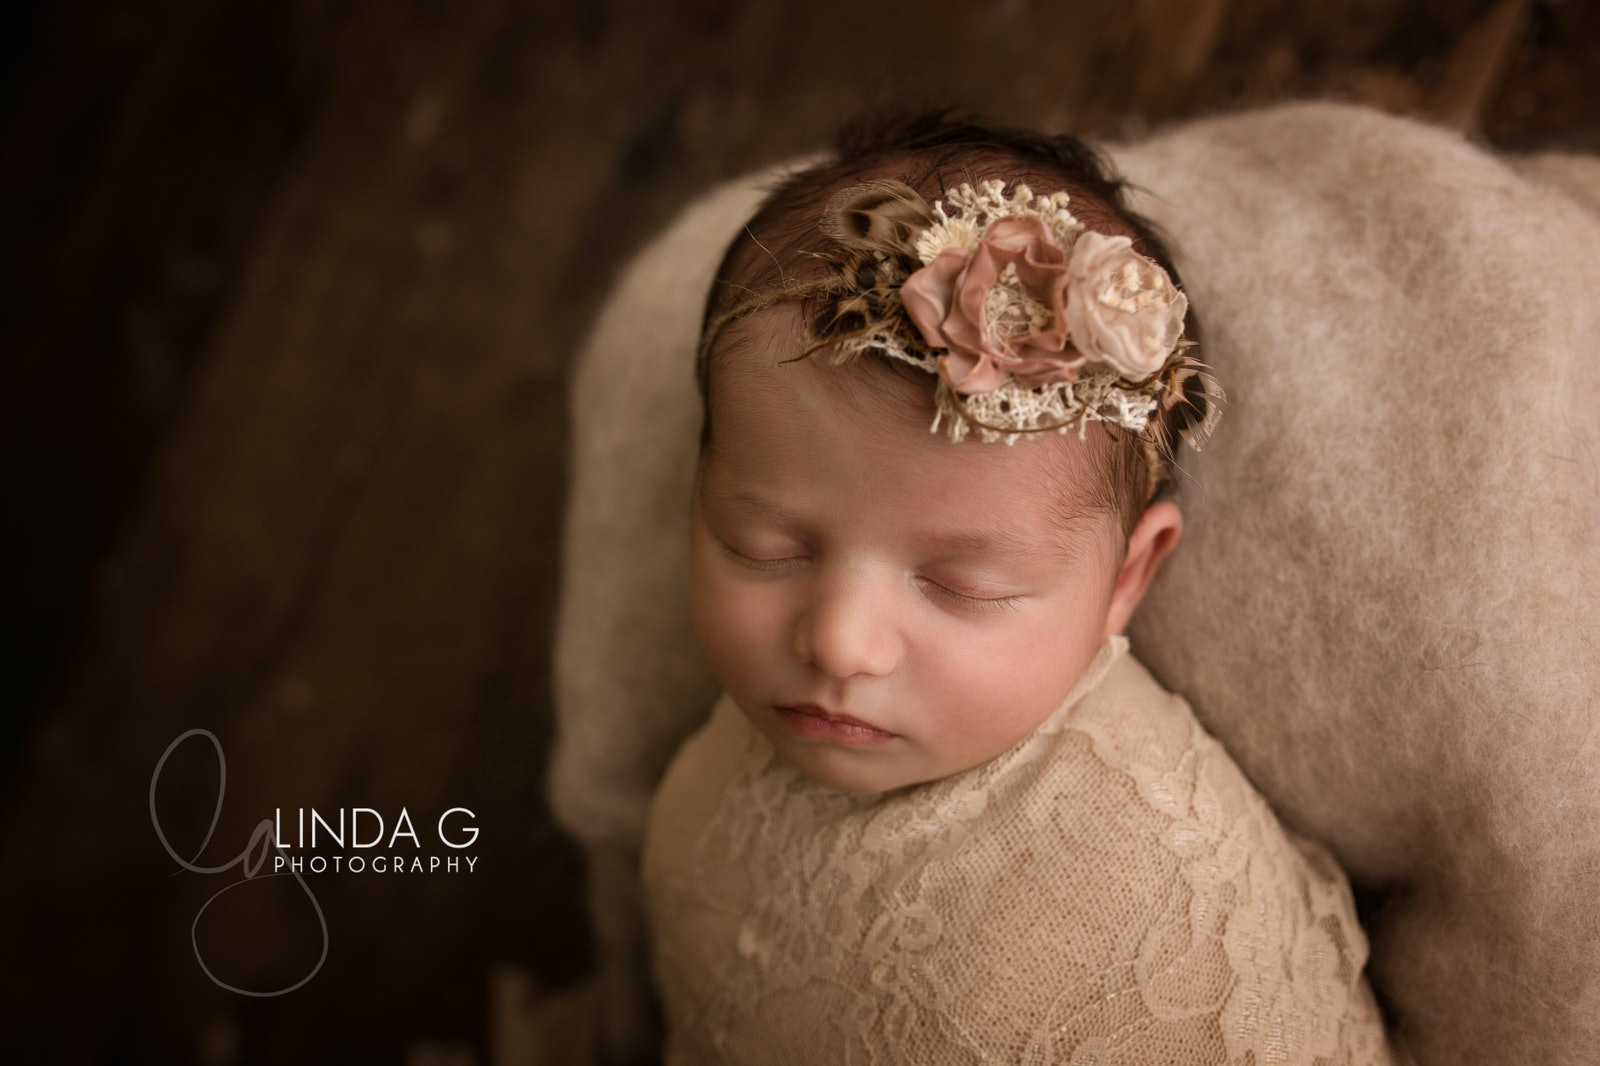 Linda G Photography 11